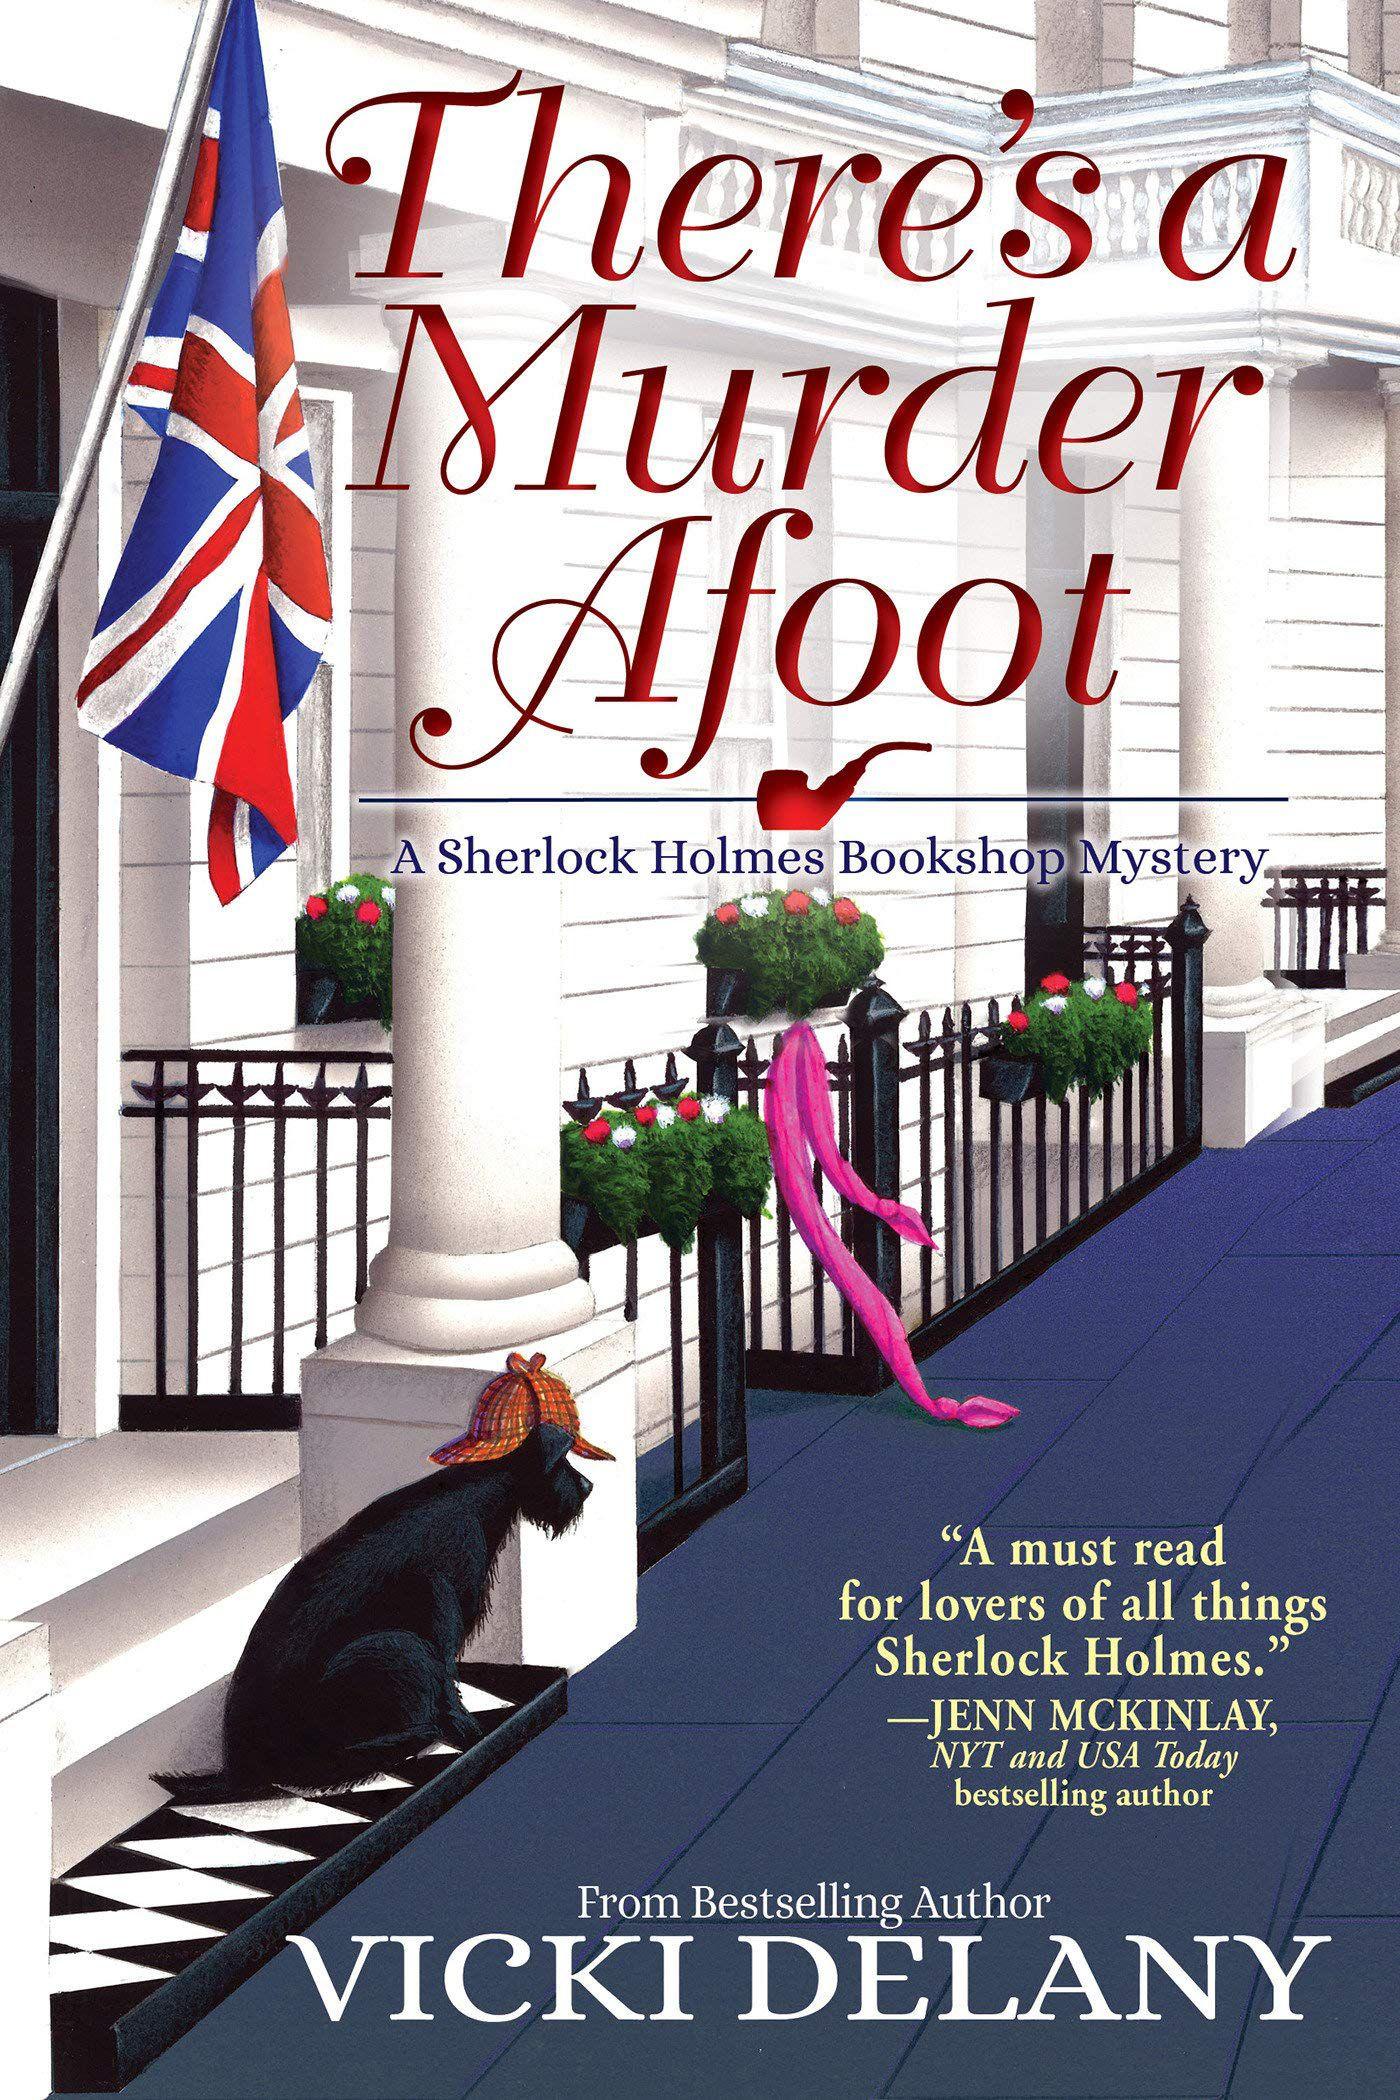 sherlock holmes bookshop mystery cover